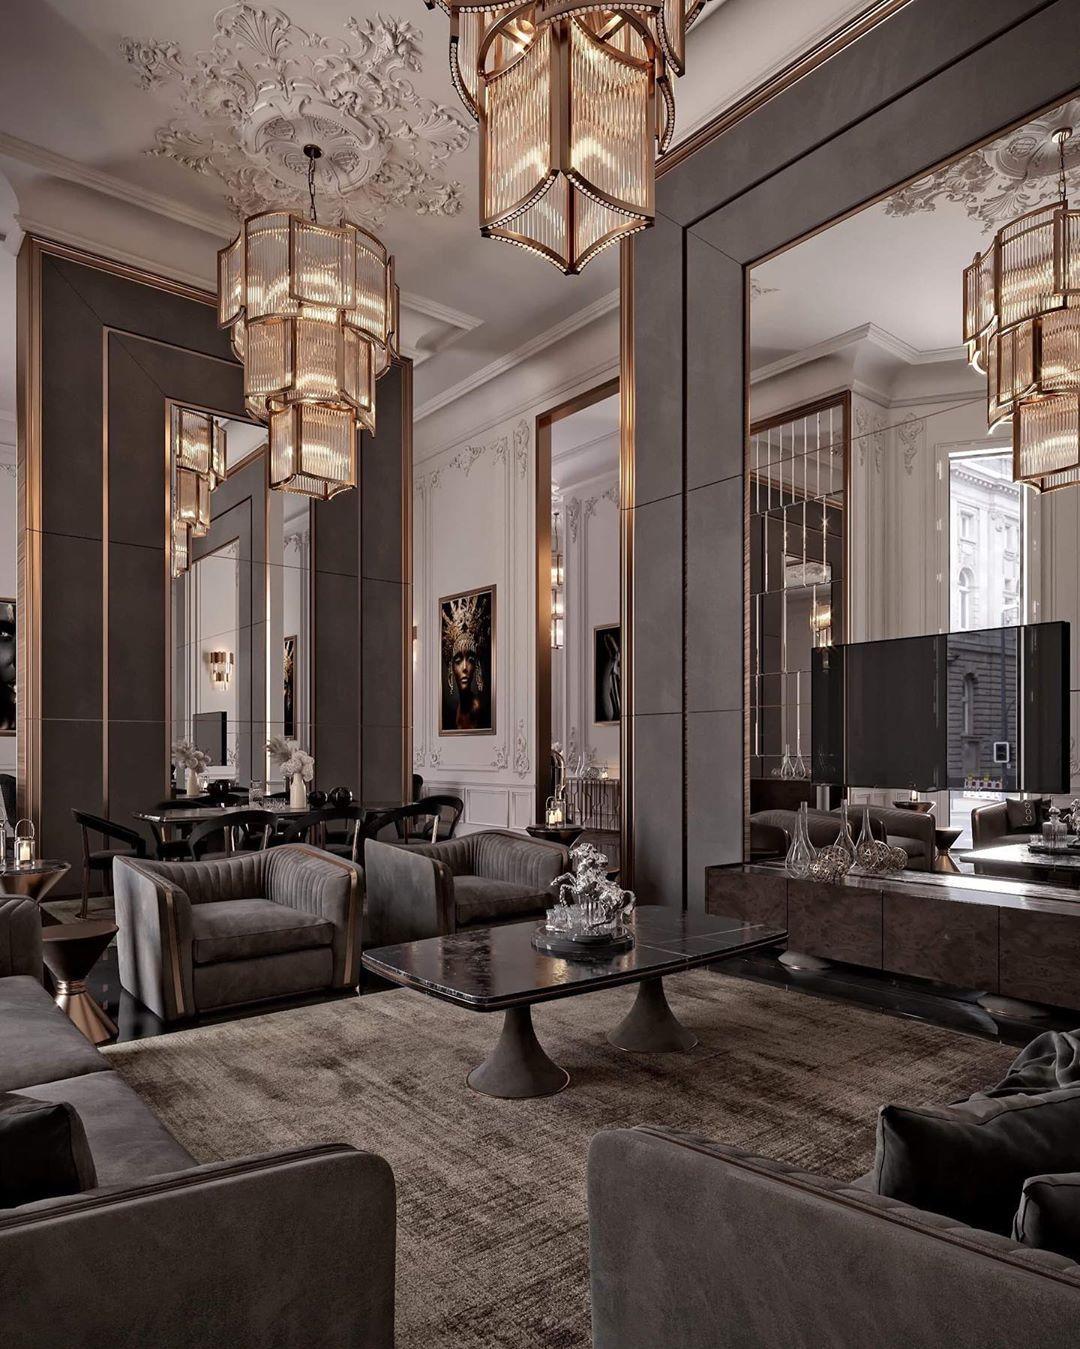 New Home Designs Latest Luxury Homes Interior Decoration: M.Serhat Sezgin On Instagram: €�3ds Max -photoshop M.Serhat